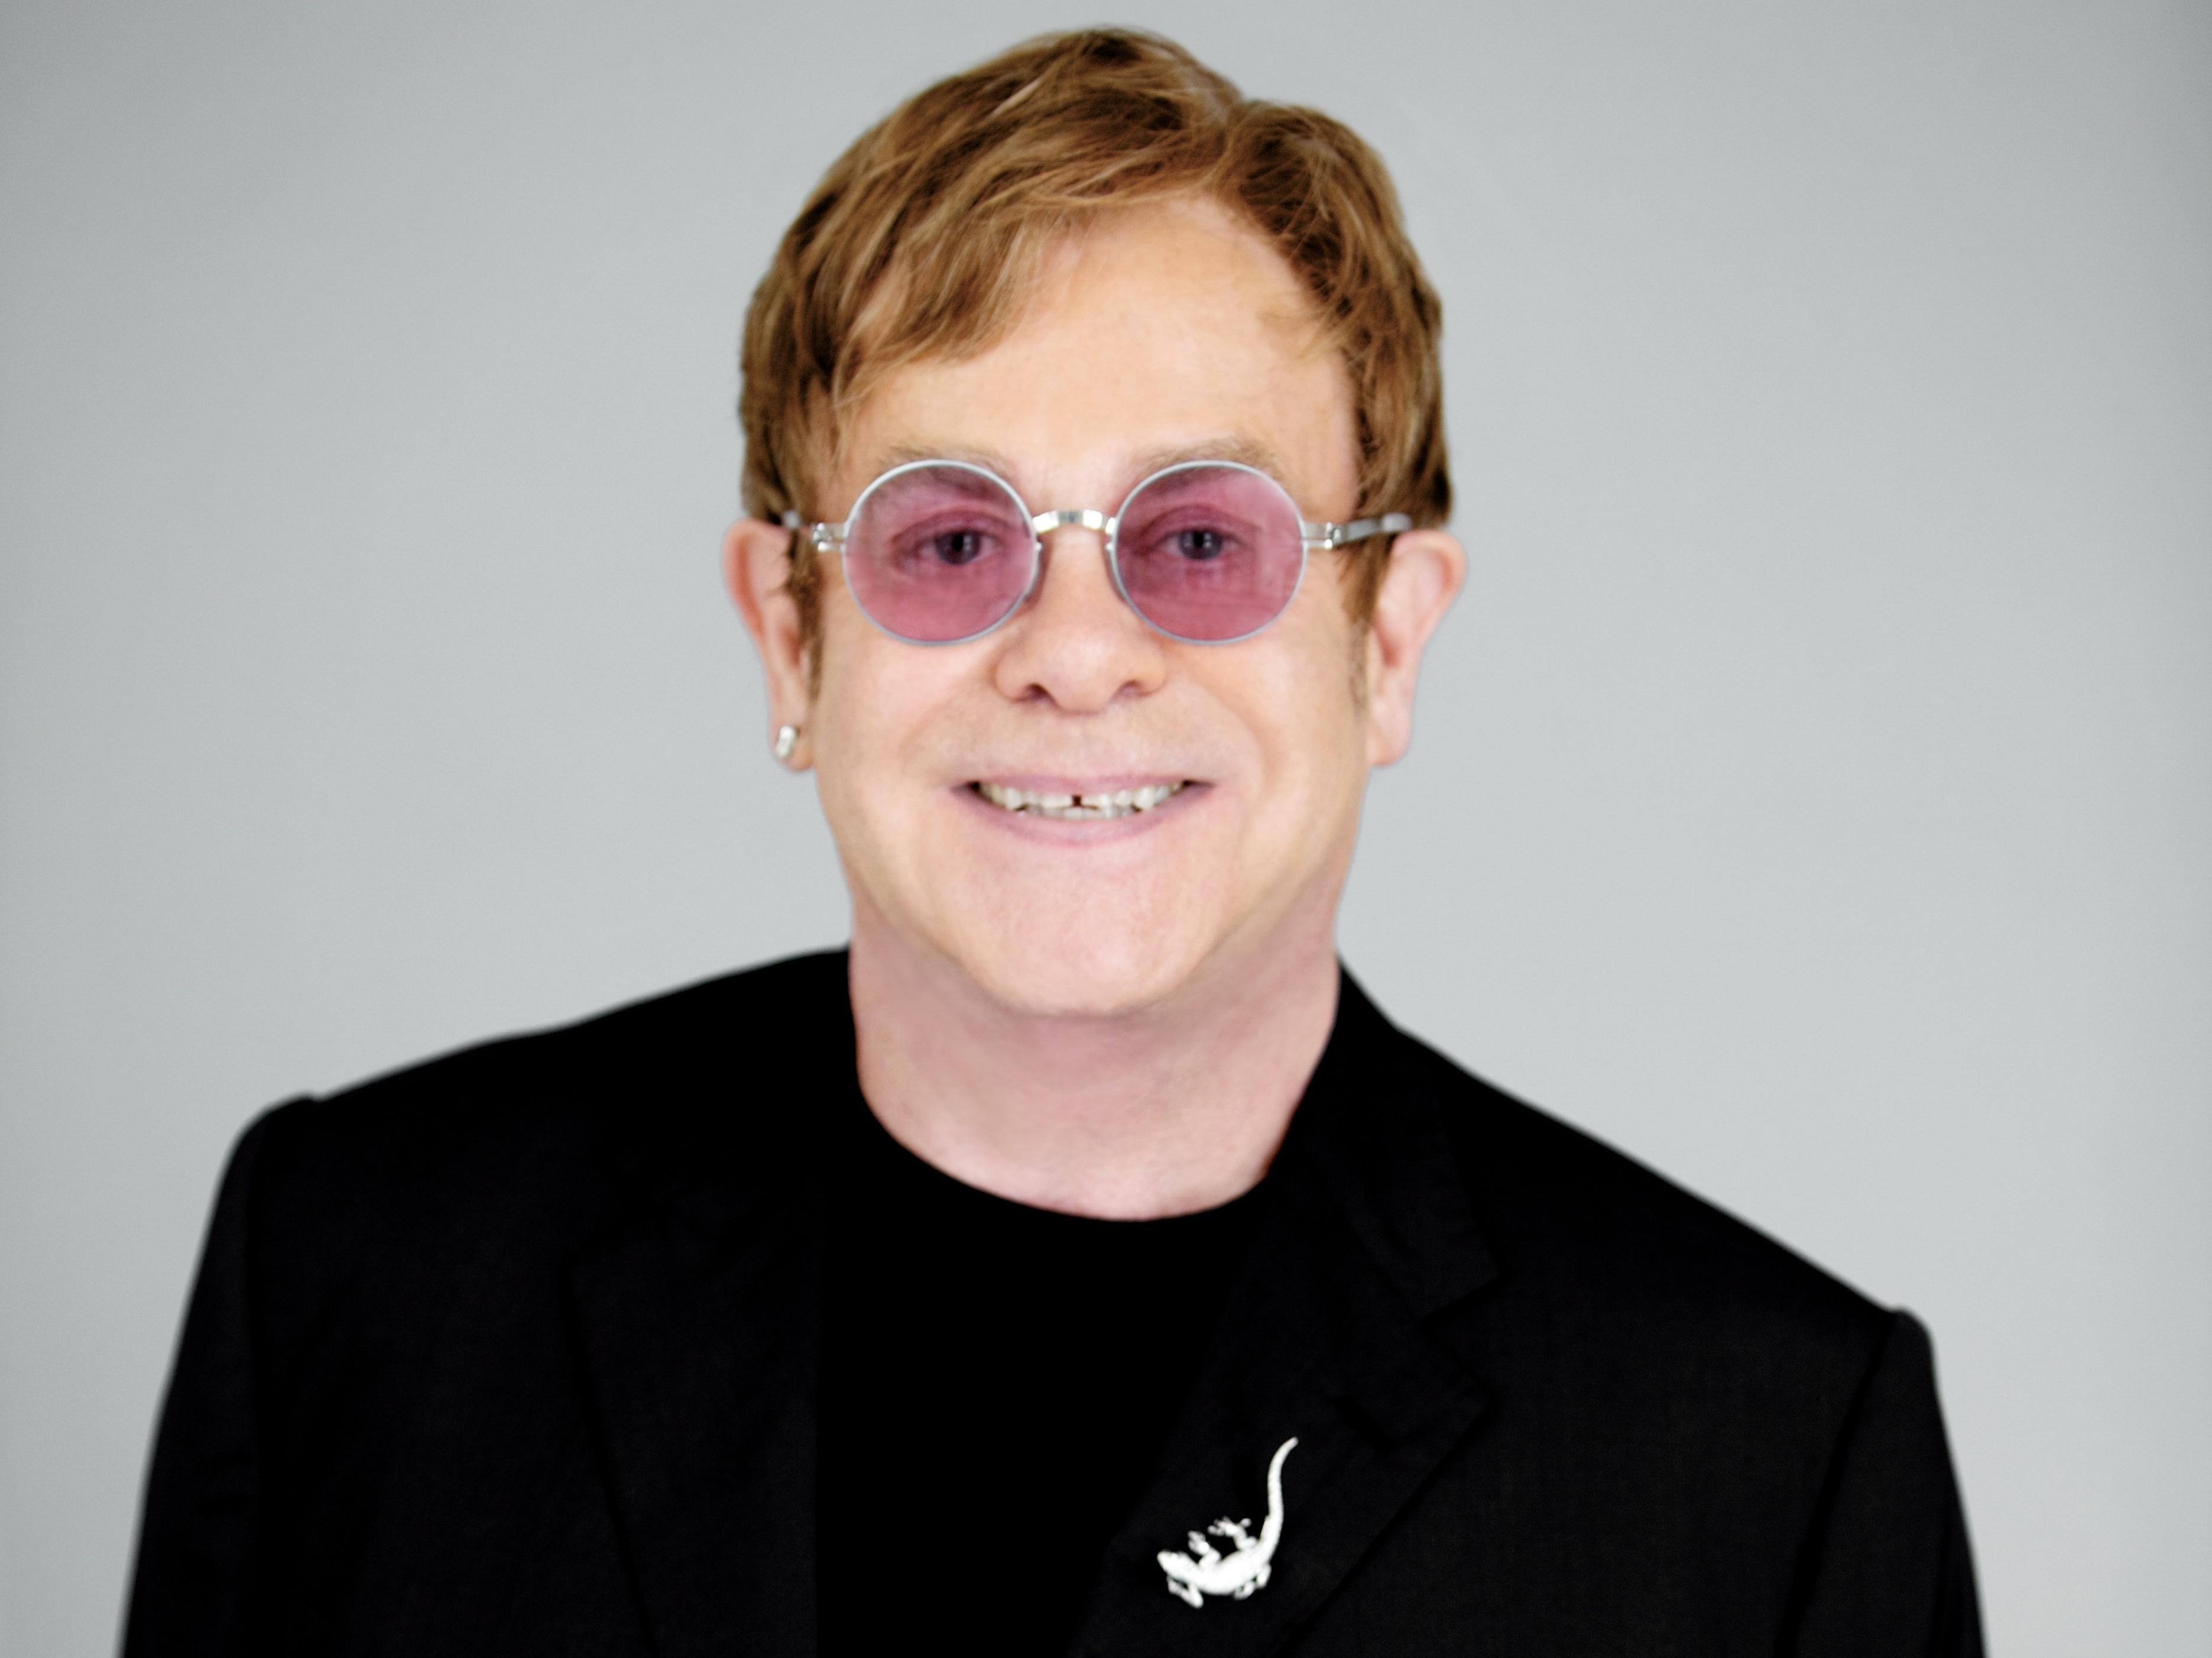 A More Reflective Leap On Elton John's 'Diving Board'